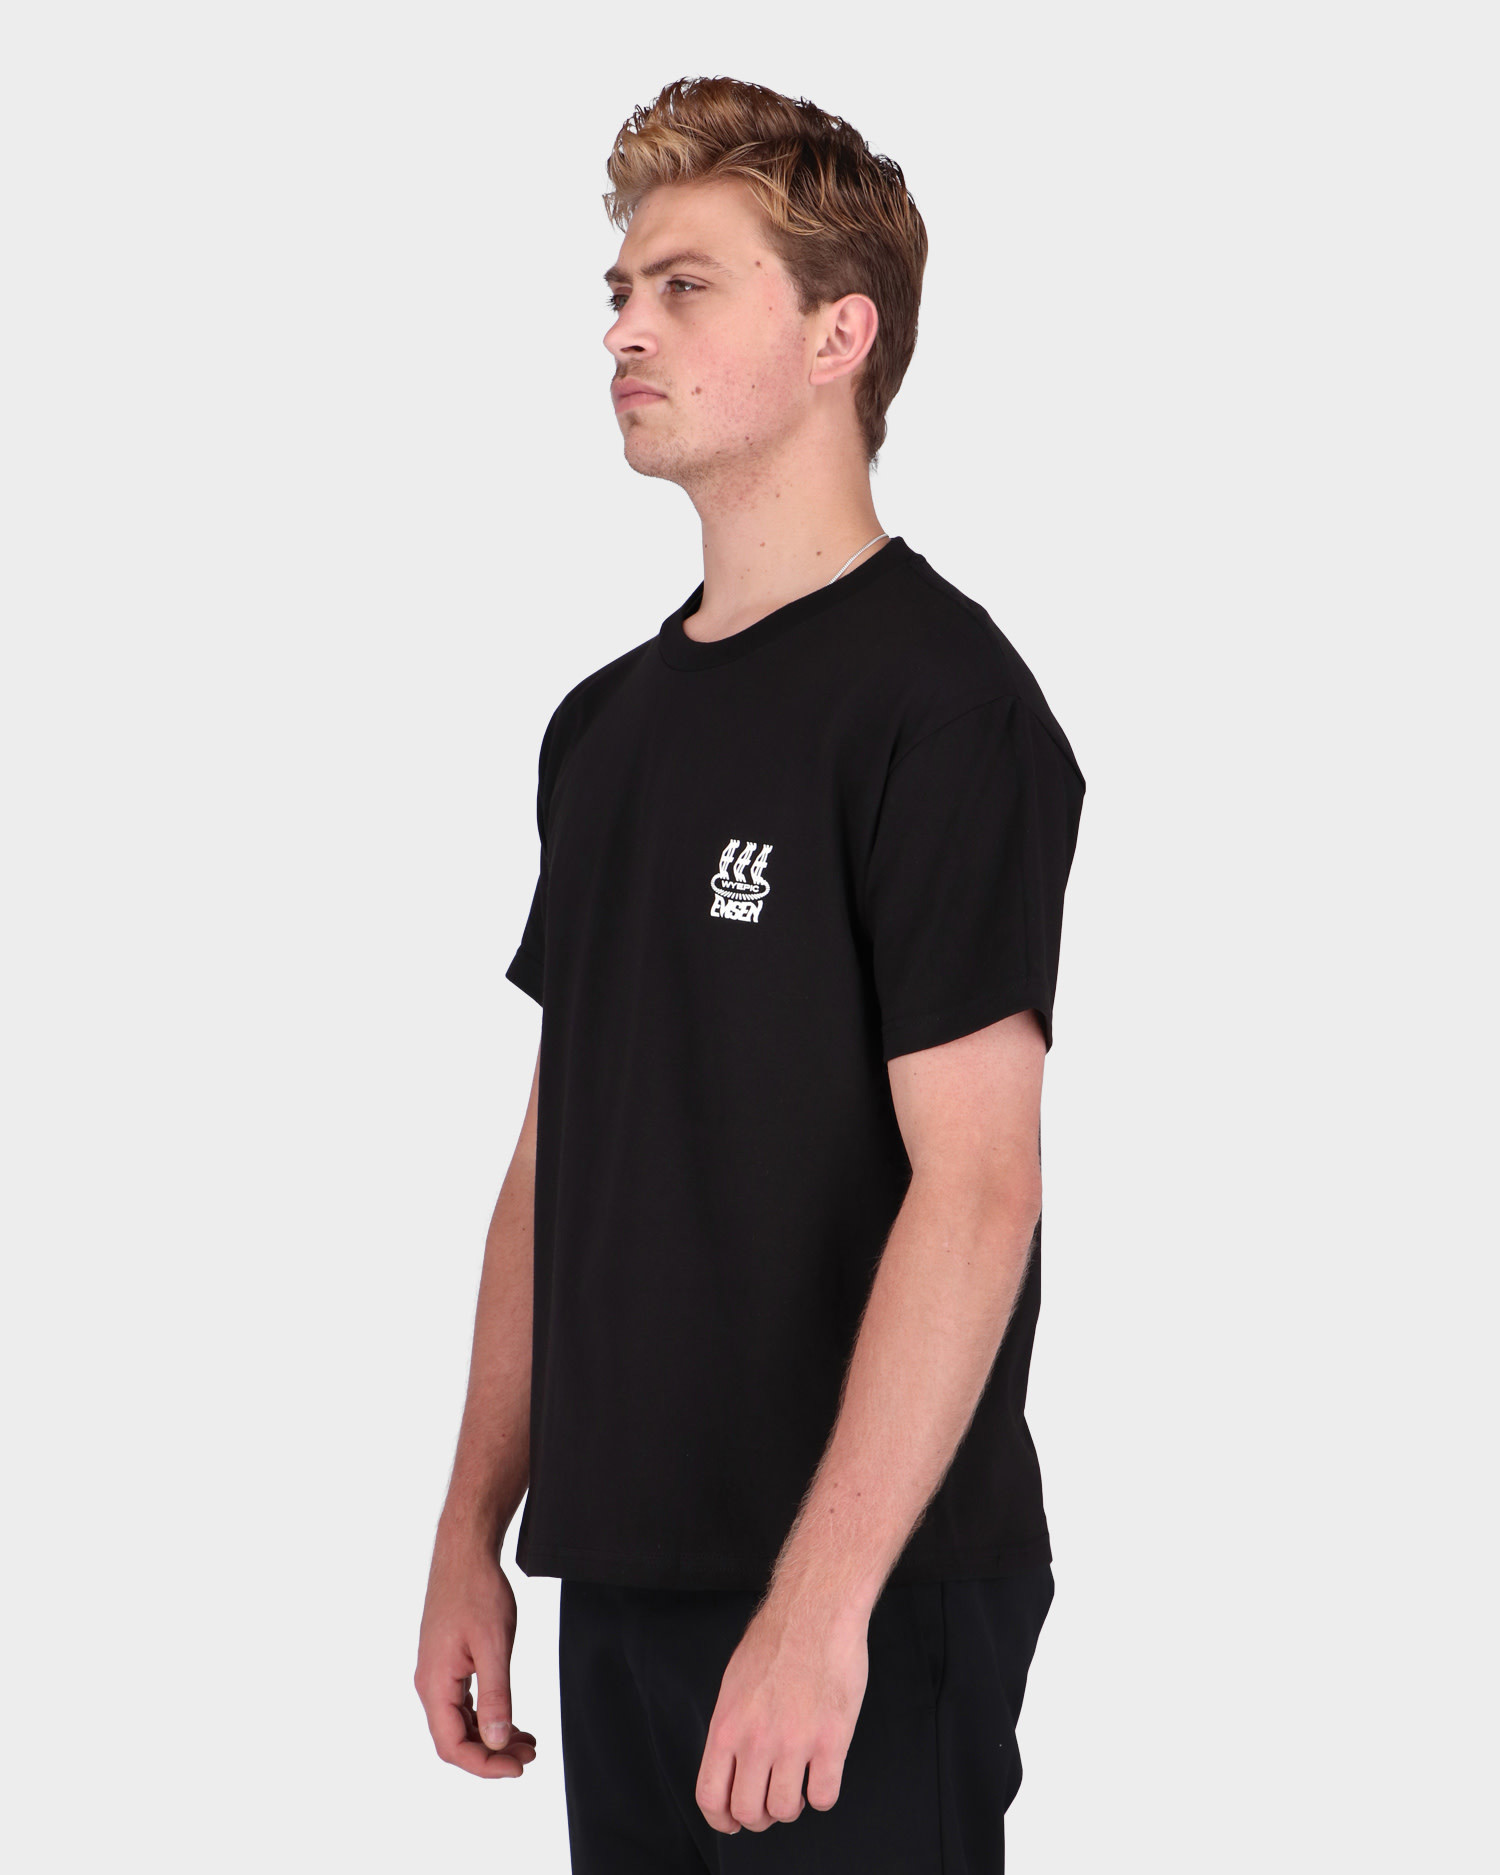 Evisen How To Tasty T-shirt Black